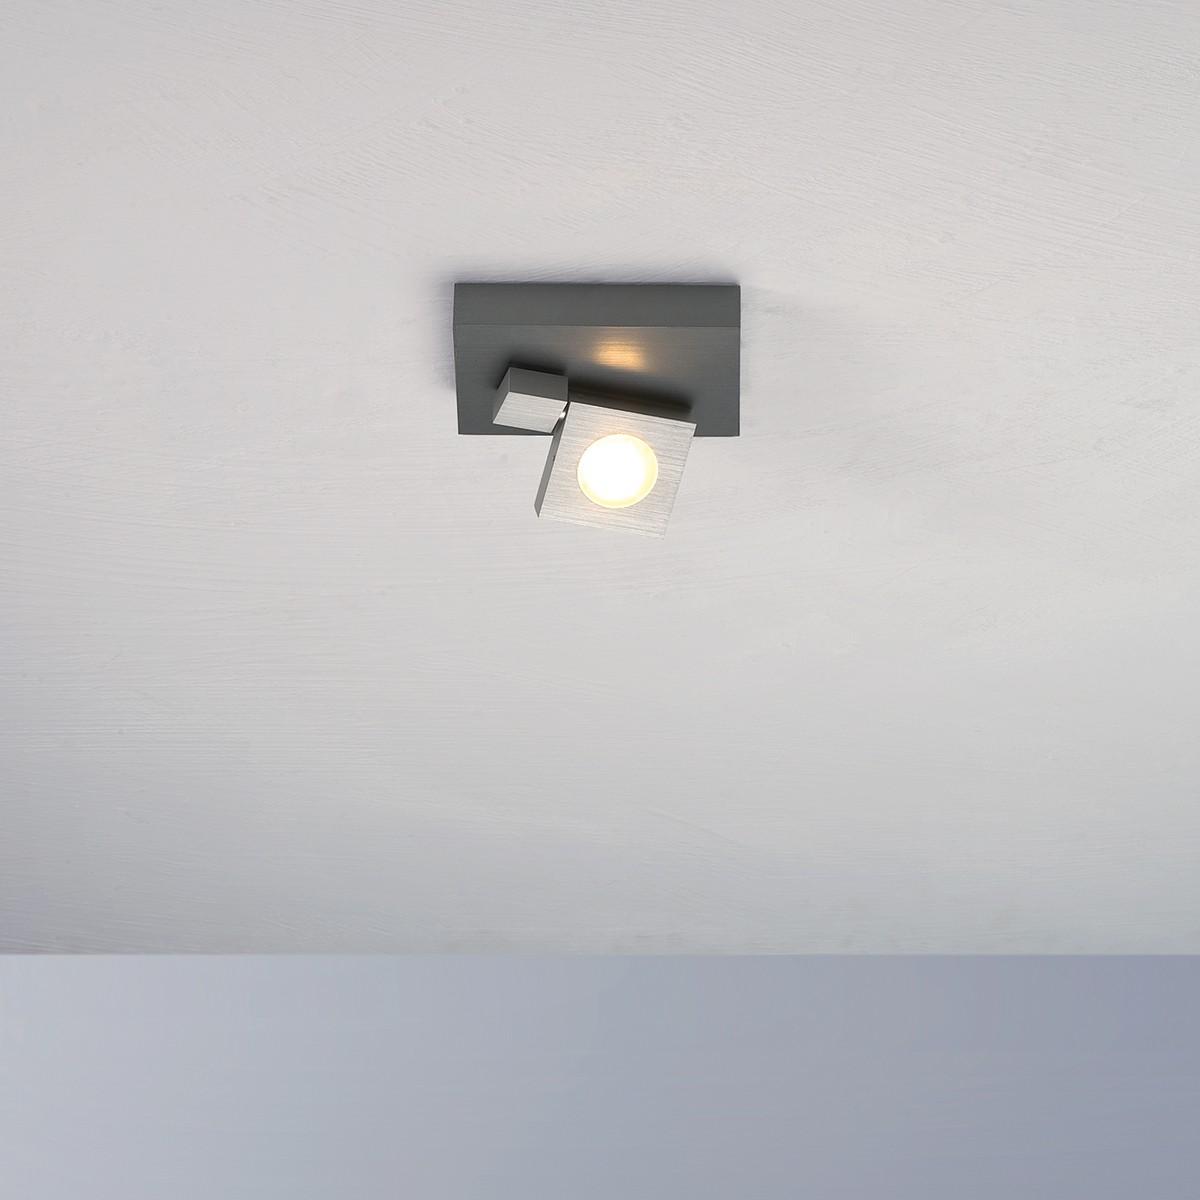 Bopp Flash LED Deckenleuchte 1-flg., Aluminium geschliffen - anthrazit lackiert